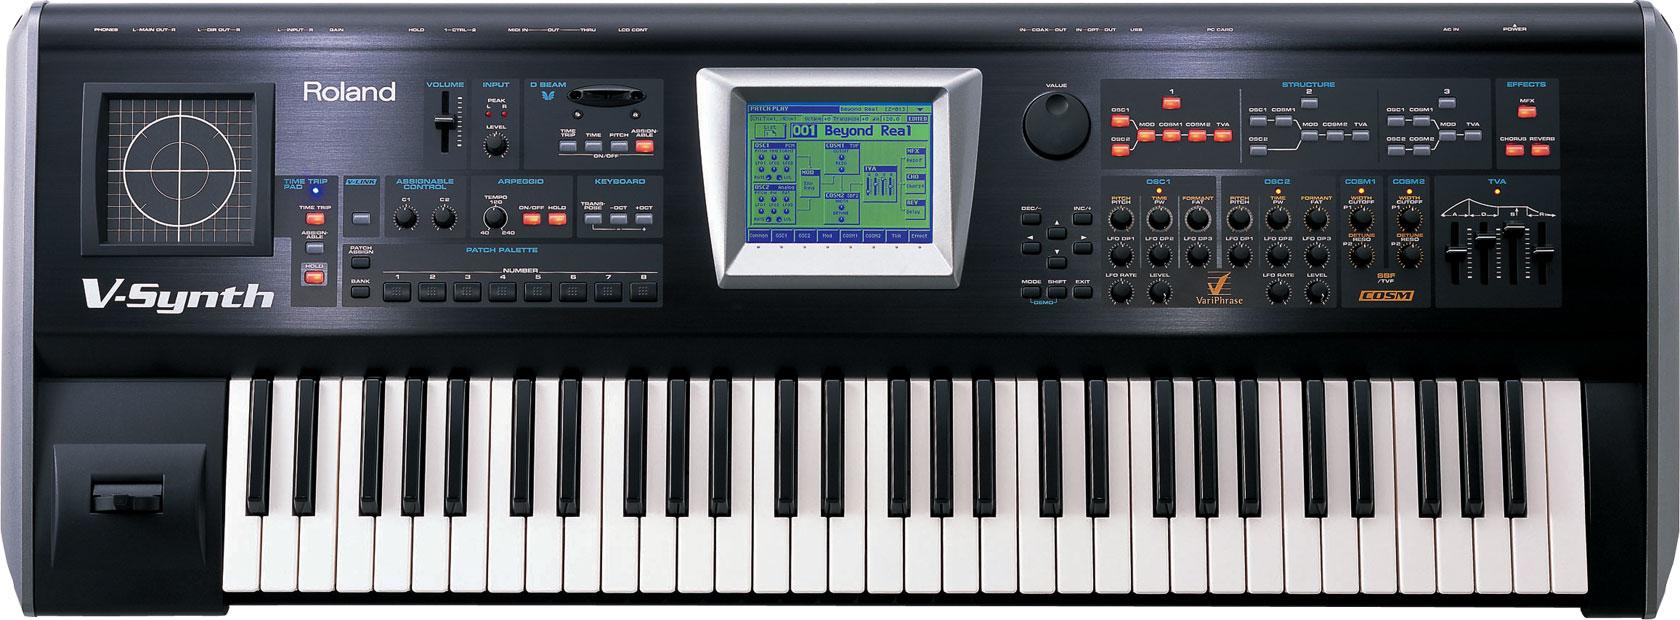 v-synth Roland Synthesizer